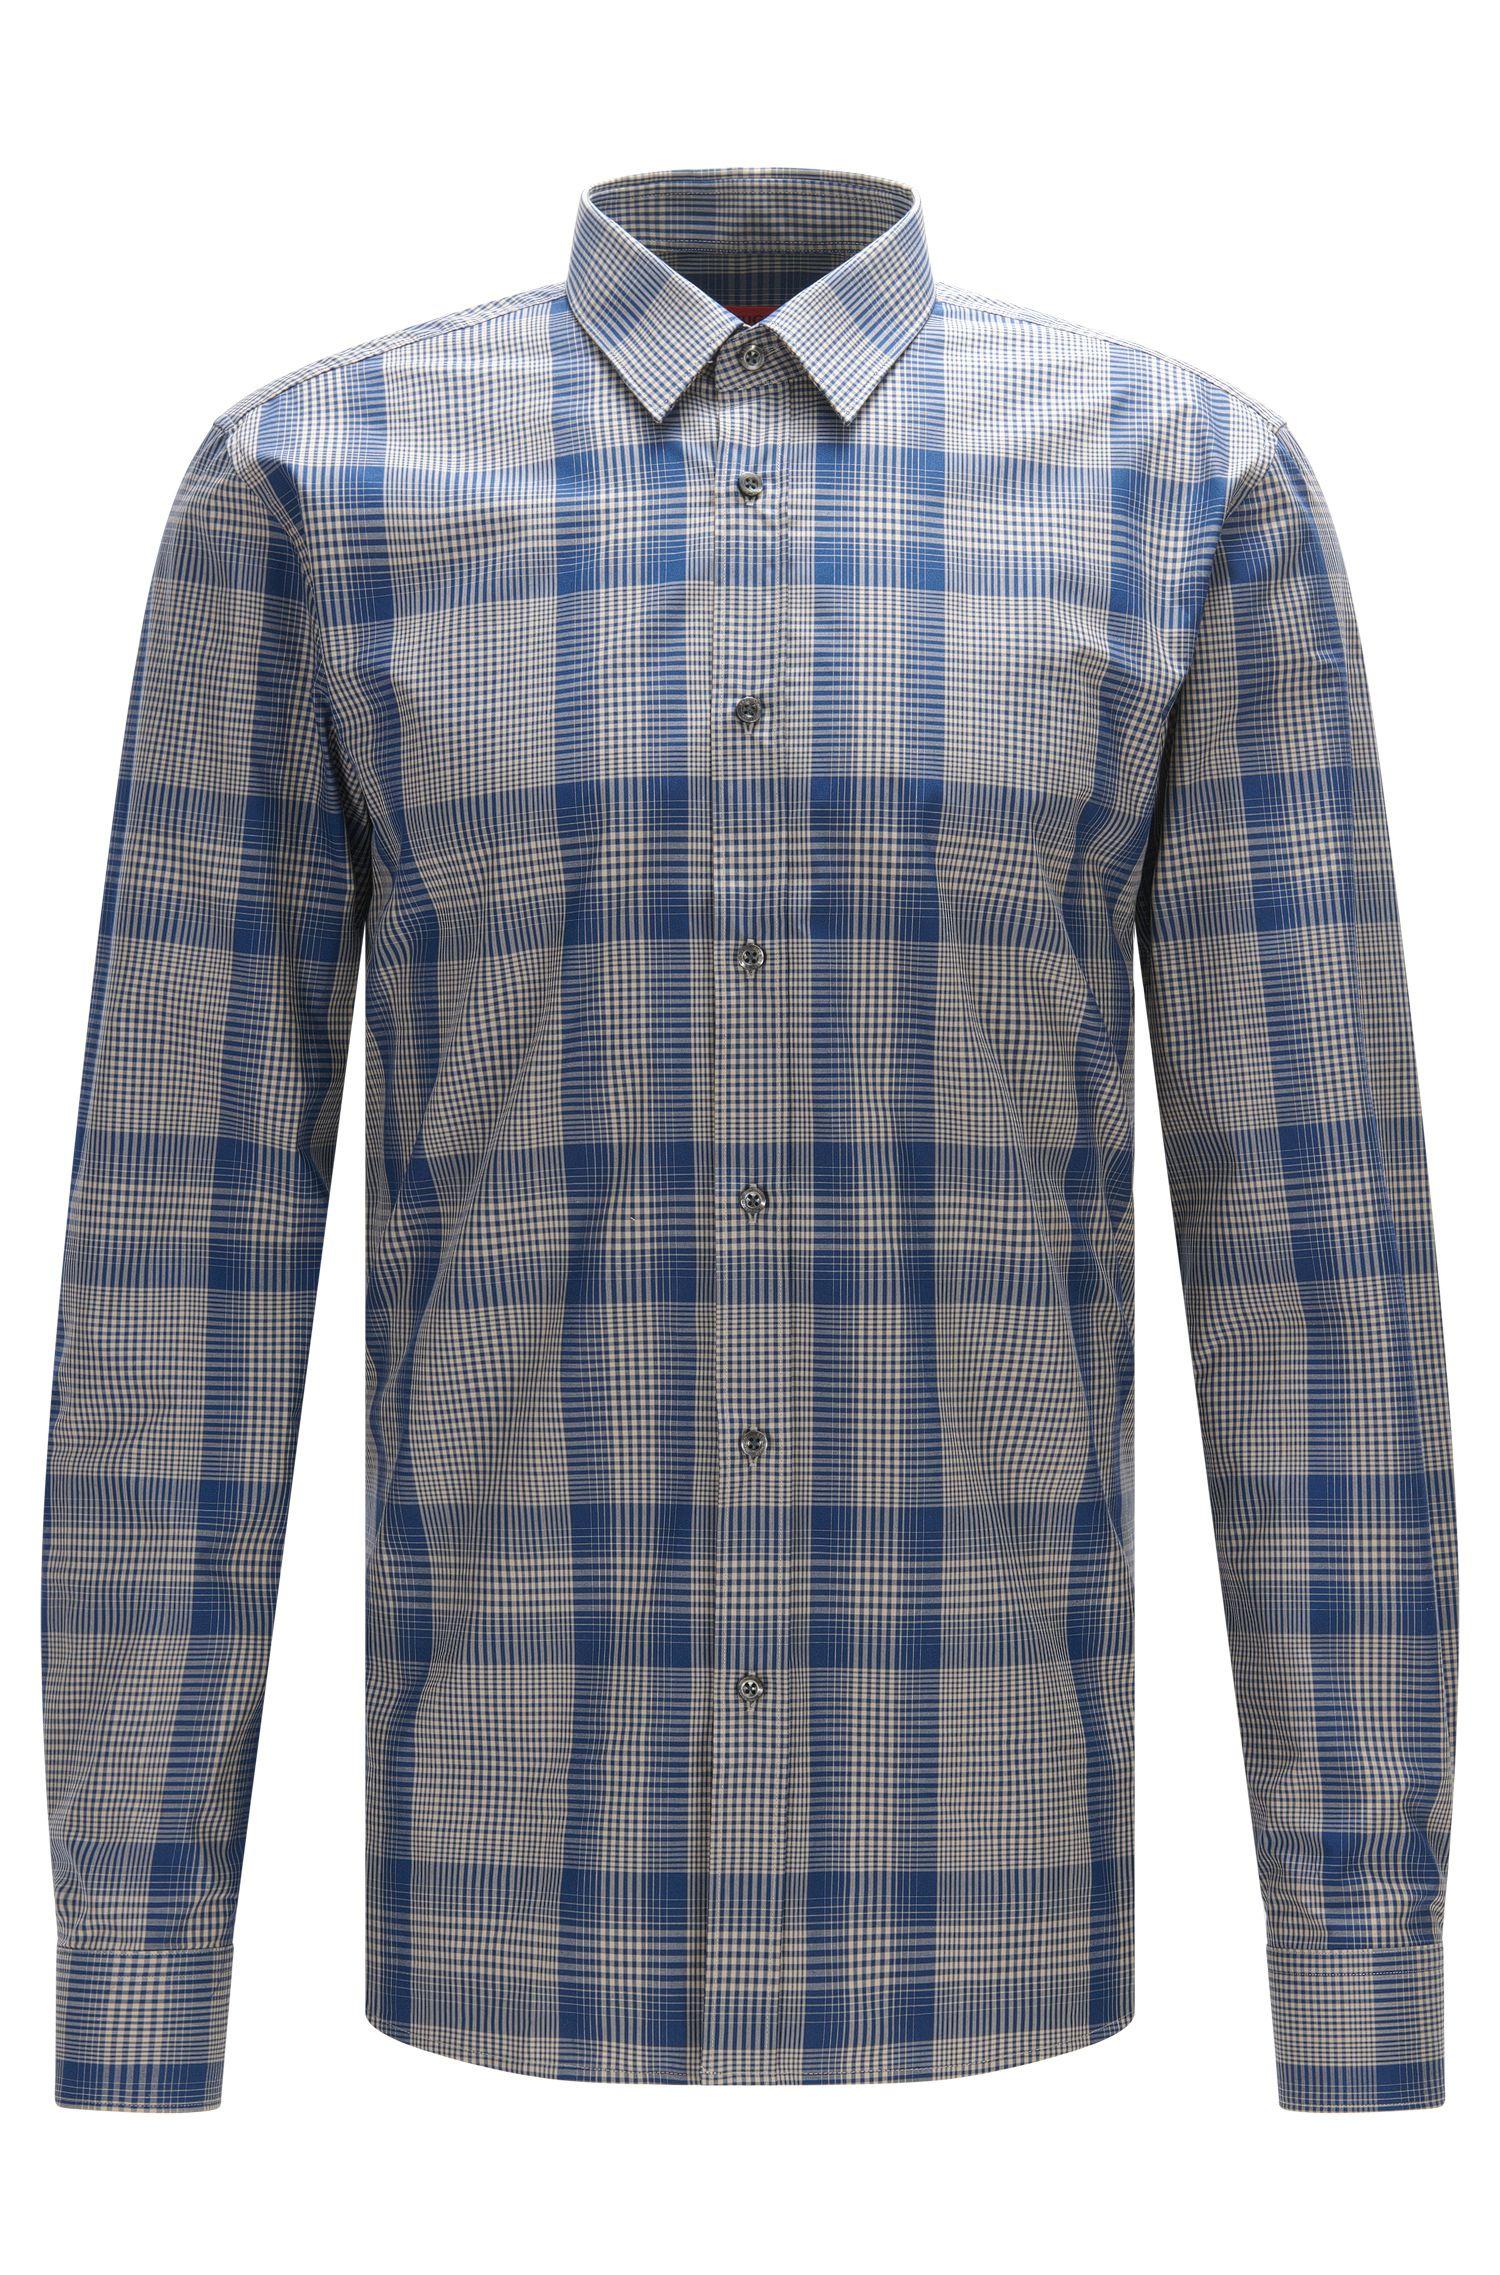 Cotton Button Down Shirt, Extra Slim Fit | Elisha